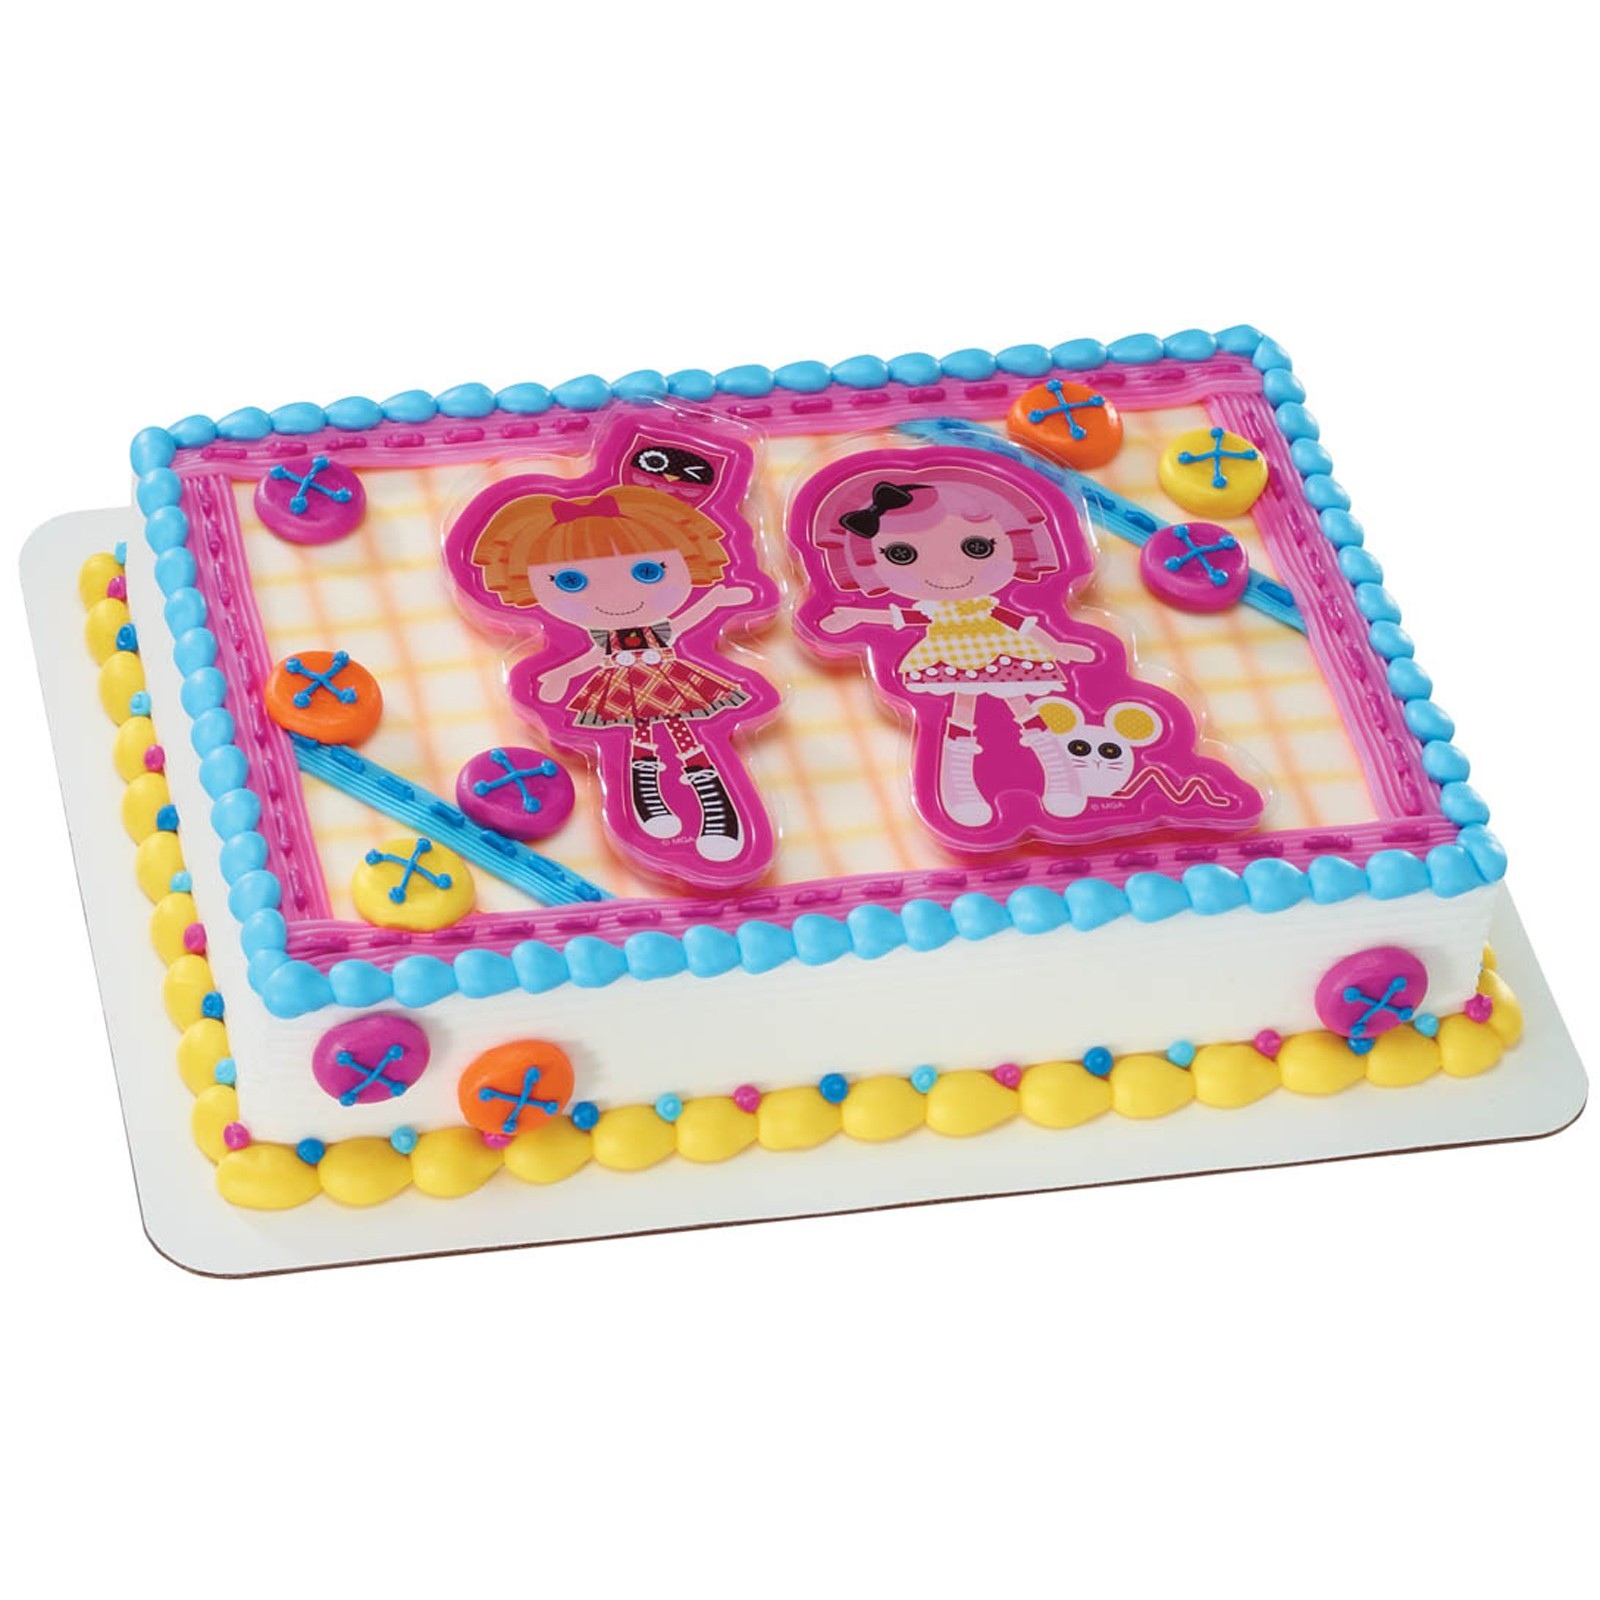 Lalaloopsy Birthday Cake Topper